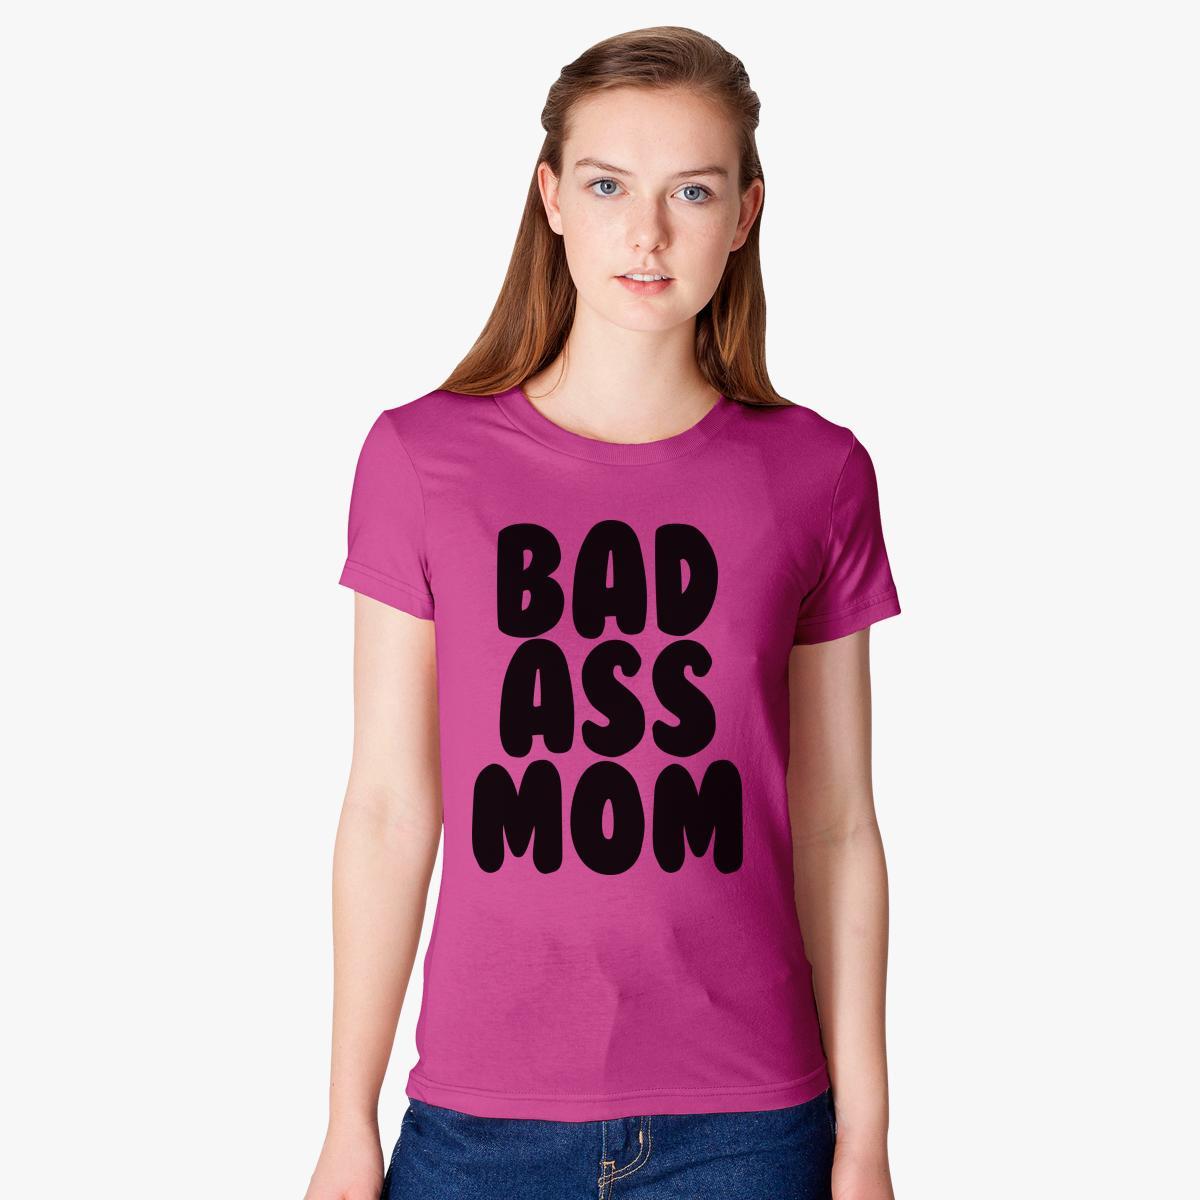 bad ass mom women's t-shirt | customon